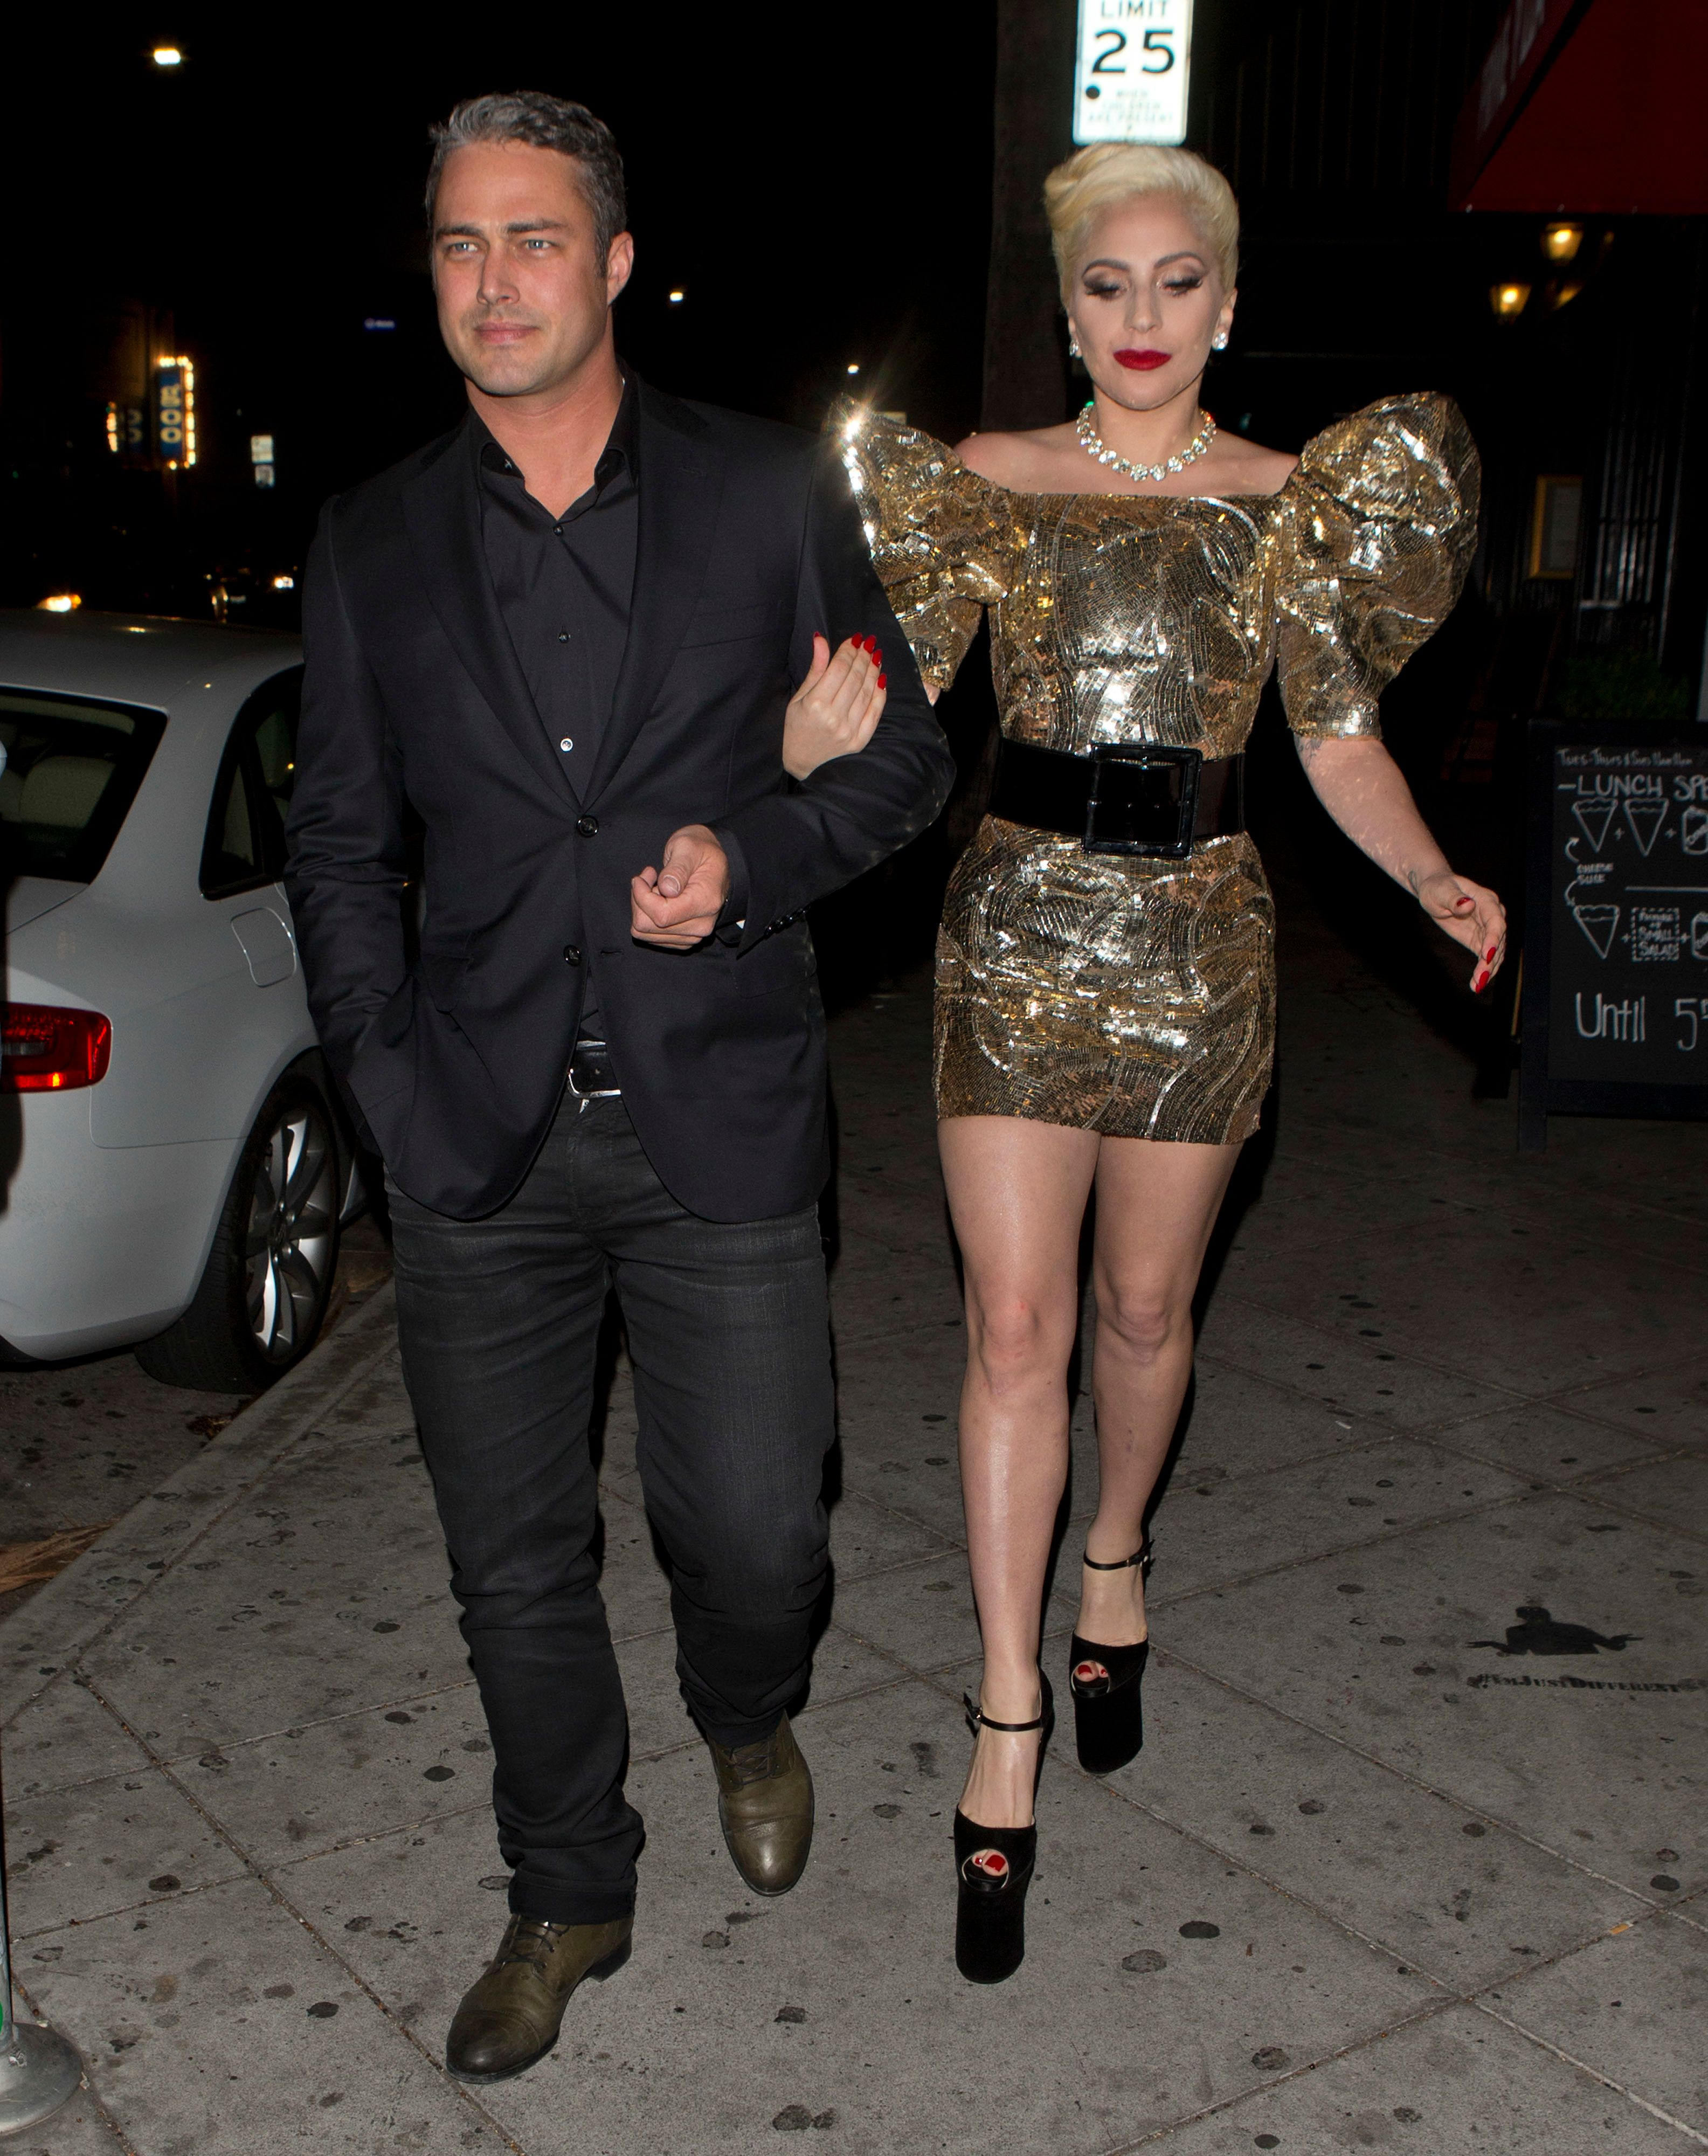 Gaga arrived on the arm of fiancé Taylor